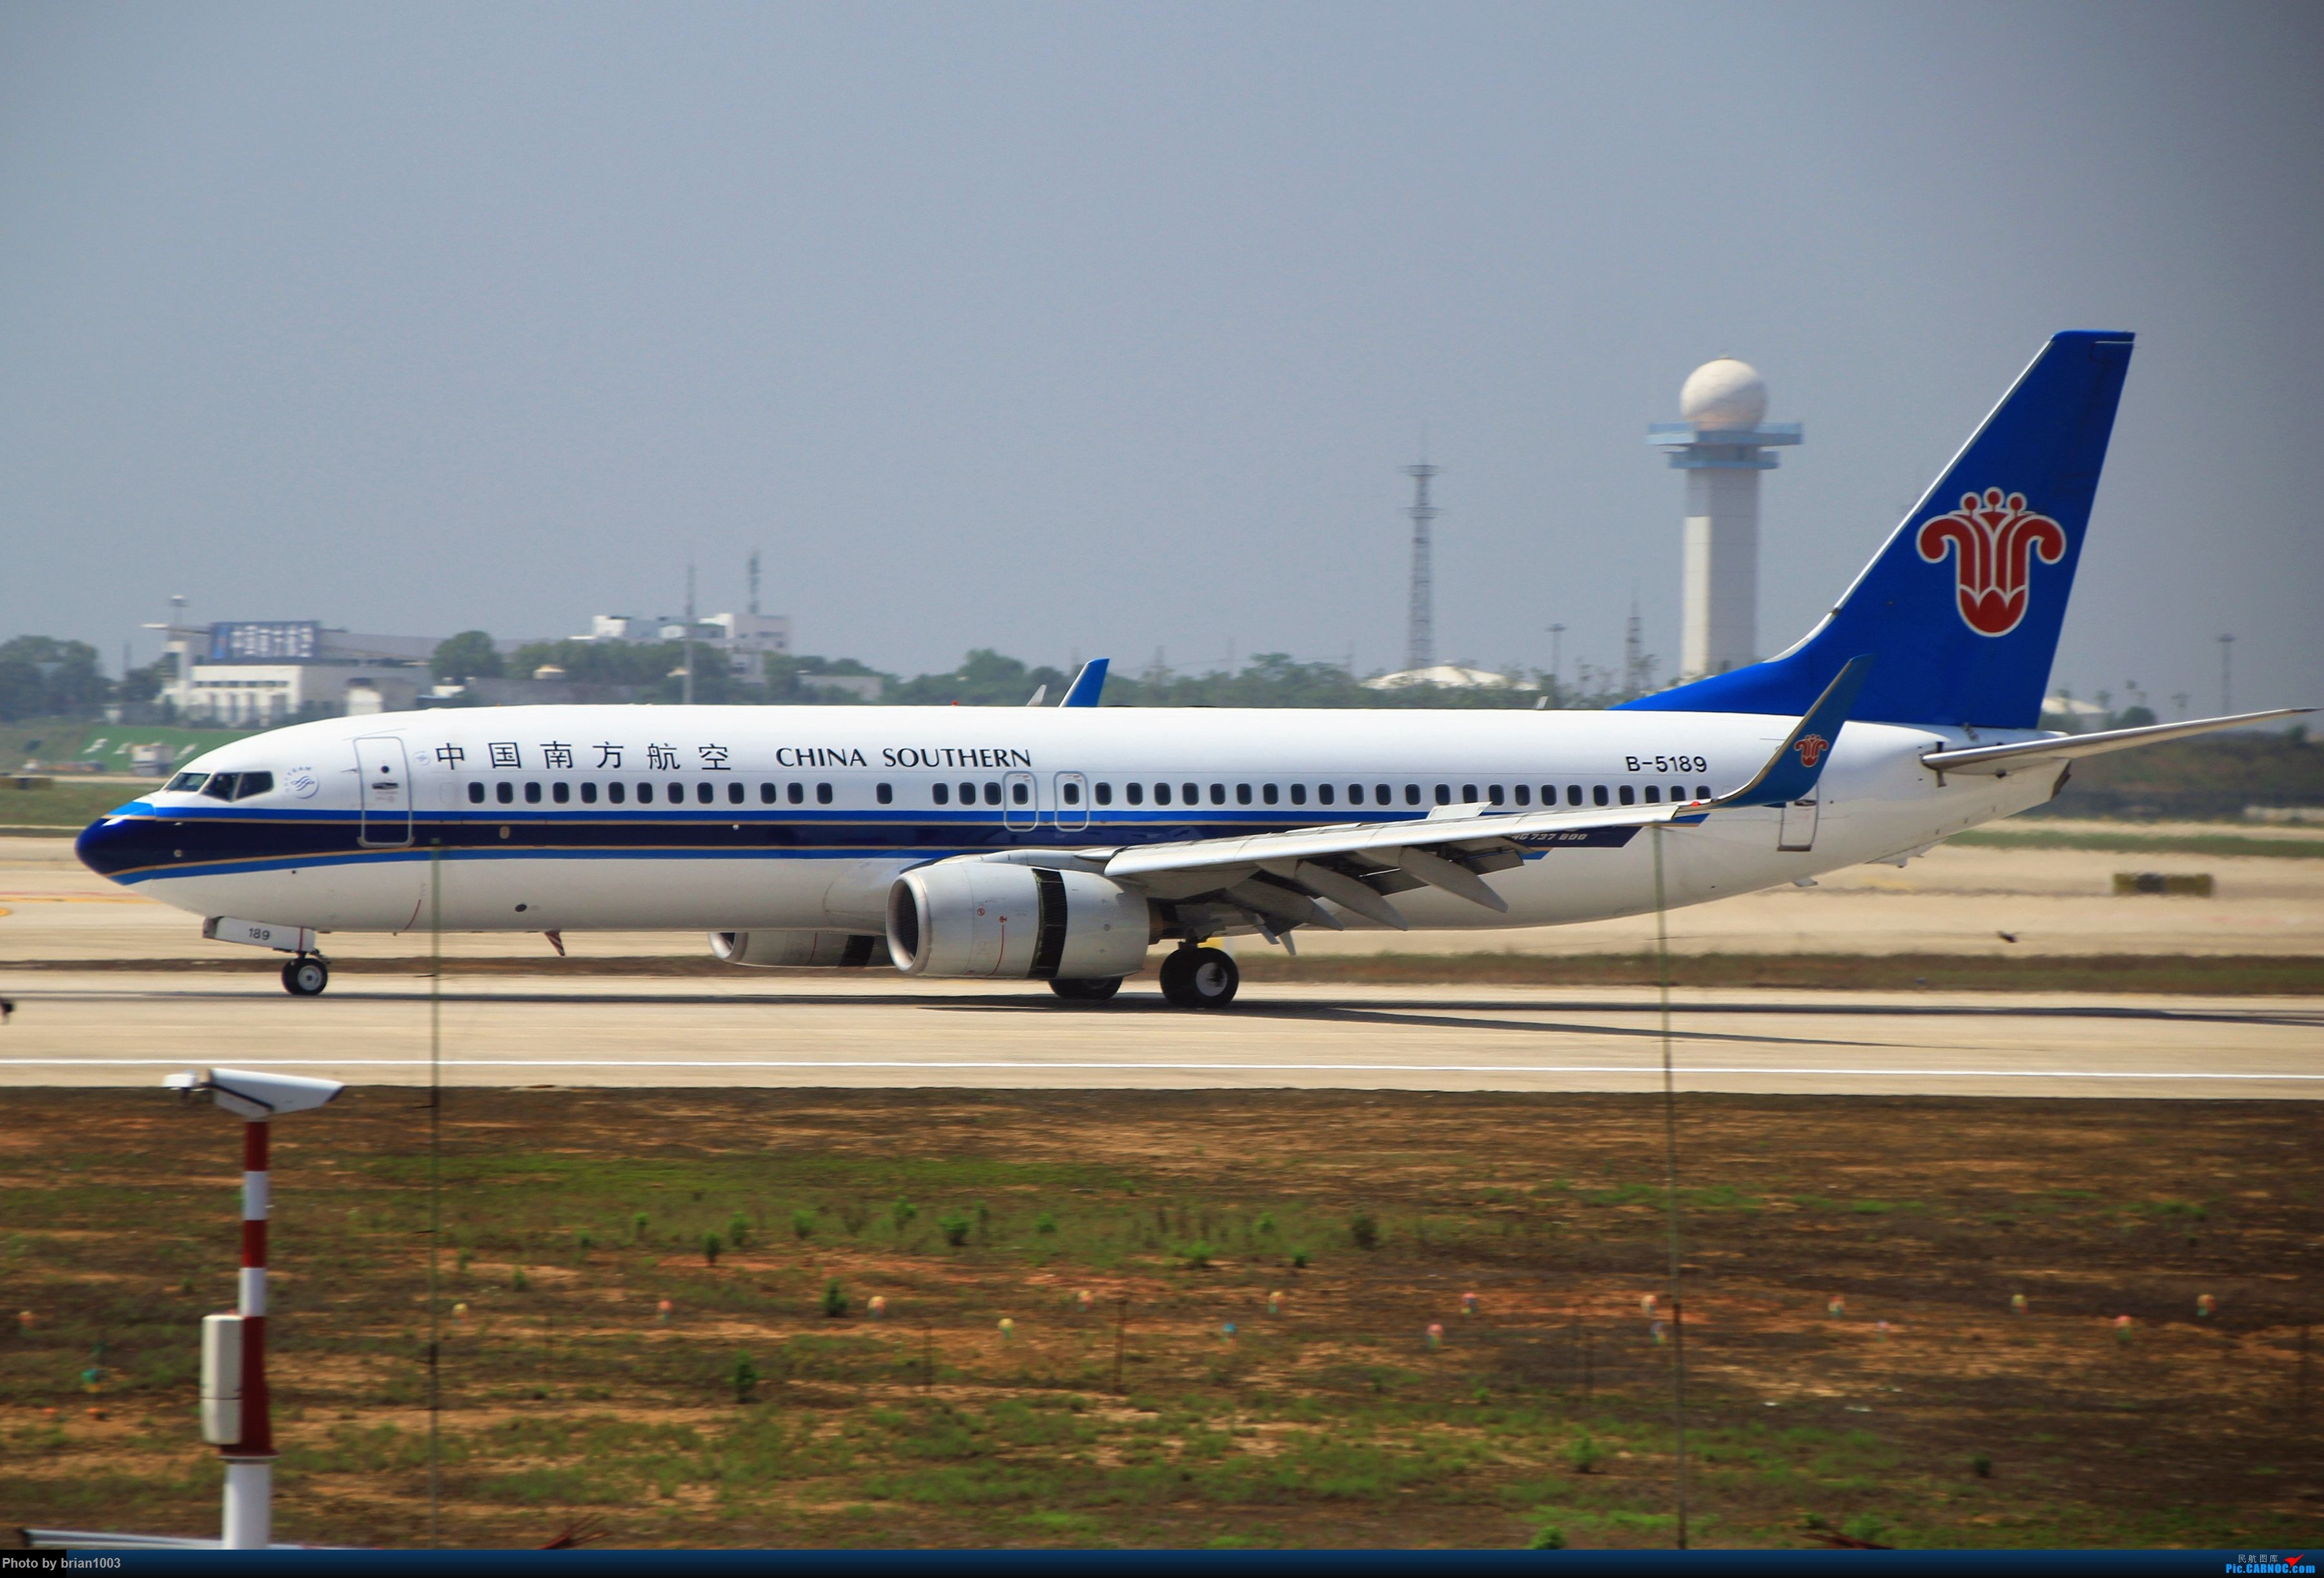 Re:[原创]WUH武汉天河机场拍机之喜迎酷航788和偶遇某其他飞机 BOEING 737-800 B-5189